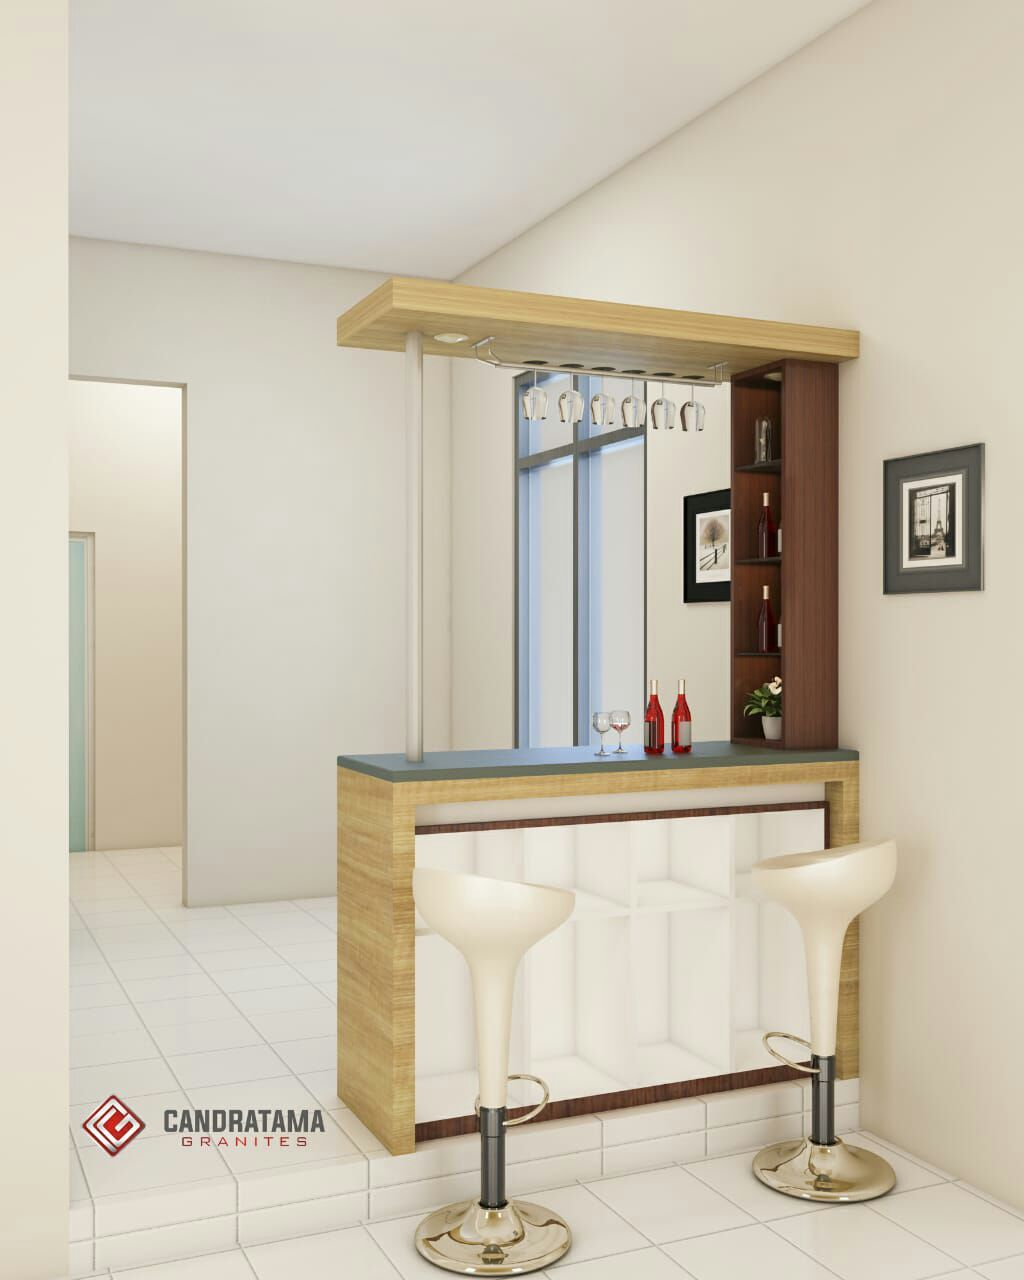 Pin Oleh Candratama Granites Di Mini Bar 08113371733 Di 2020